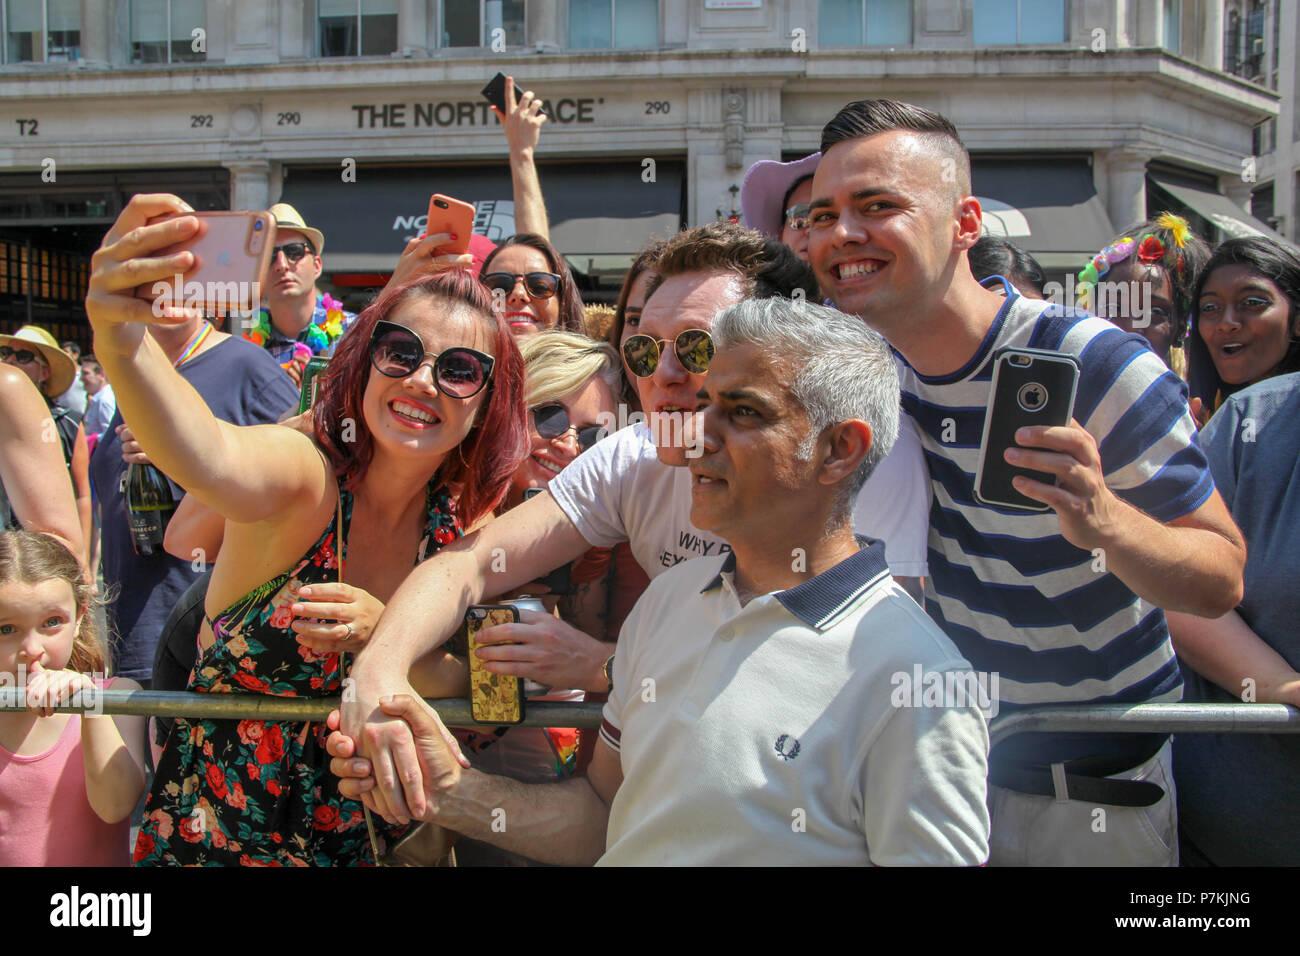 London, UK. 7th July 2018. Sadiq Khan at London Pride Credit: Alex Cavendish/Alamy Live News - Stock Image